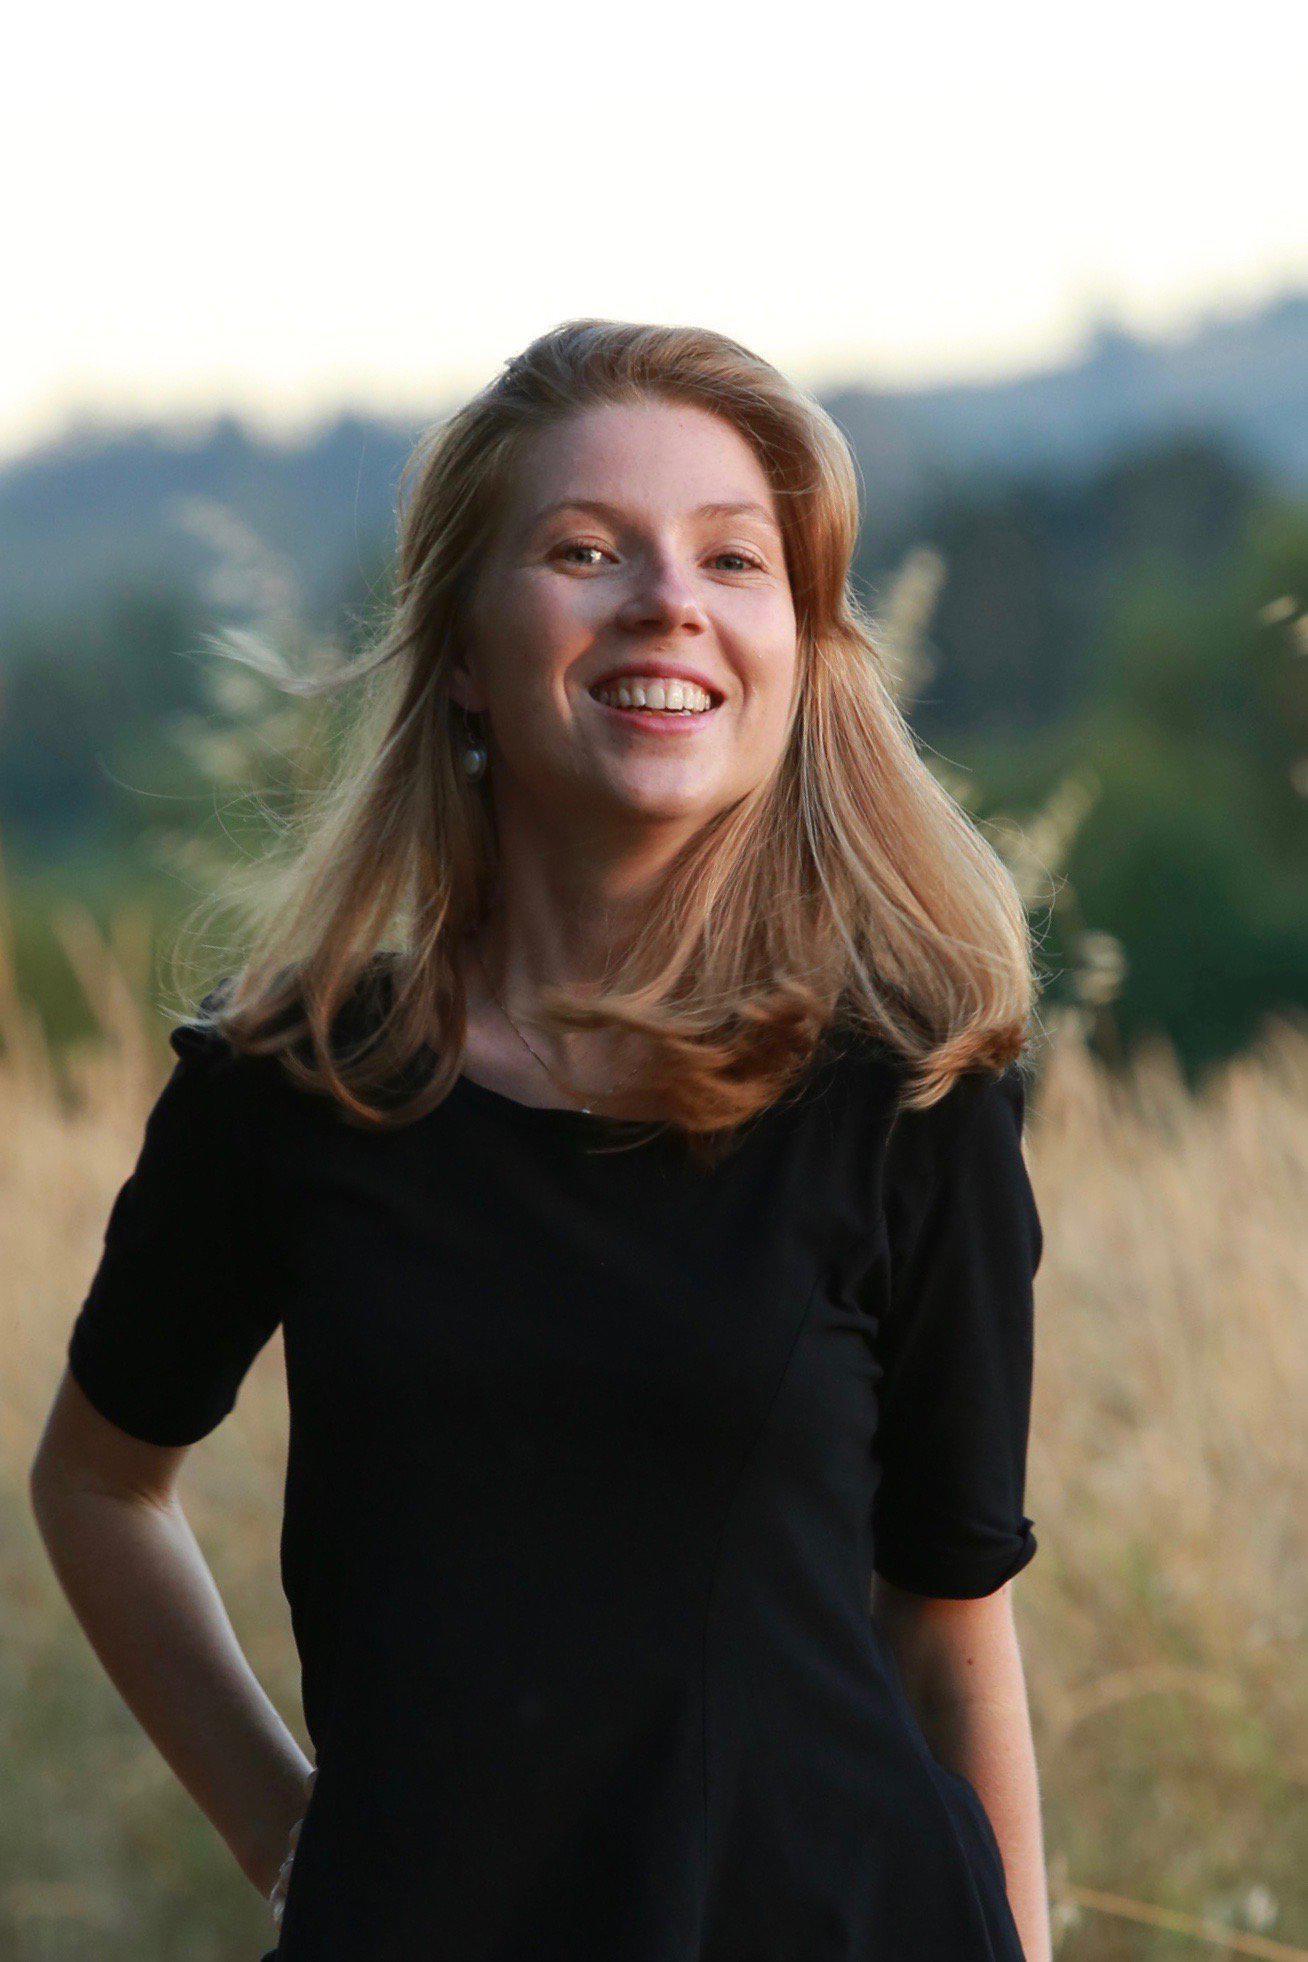 Emma McAleavy